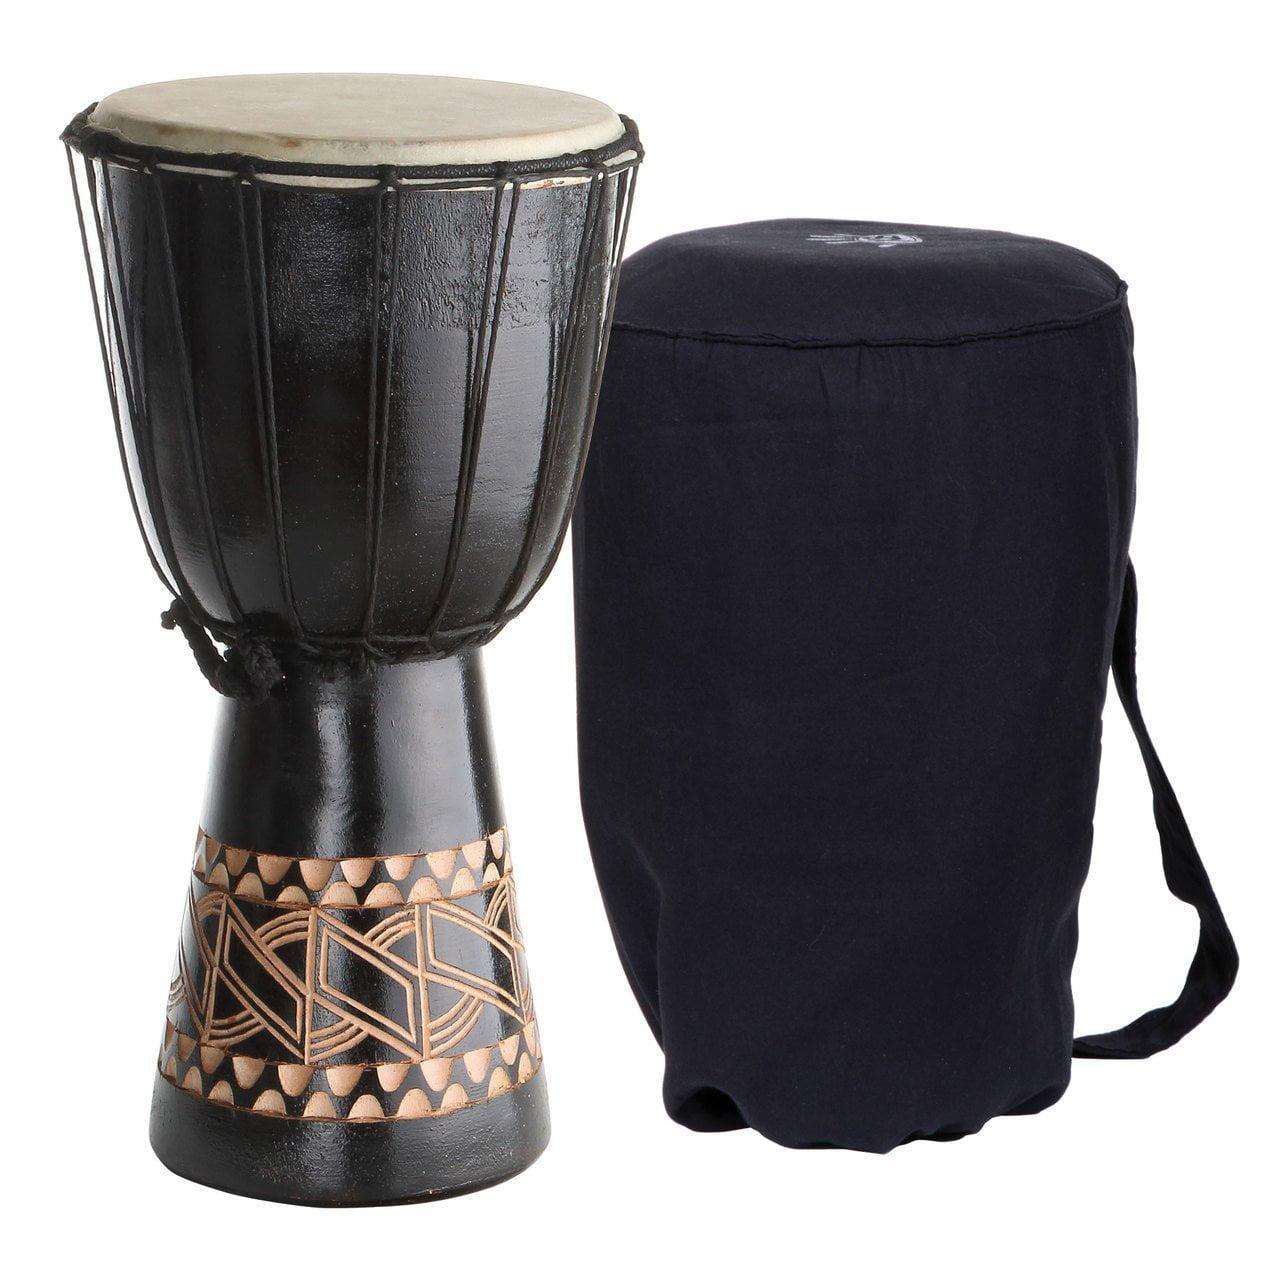 Small Djembe Drum, X8 Tribal Backpacker Small 16 Inch Dje...